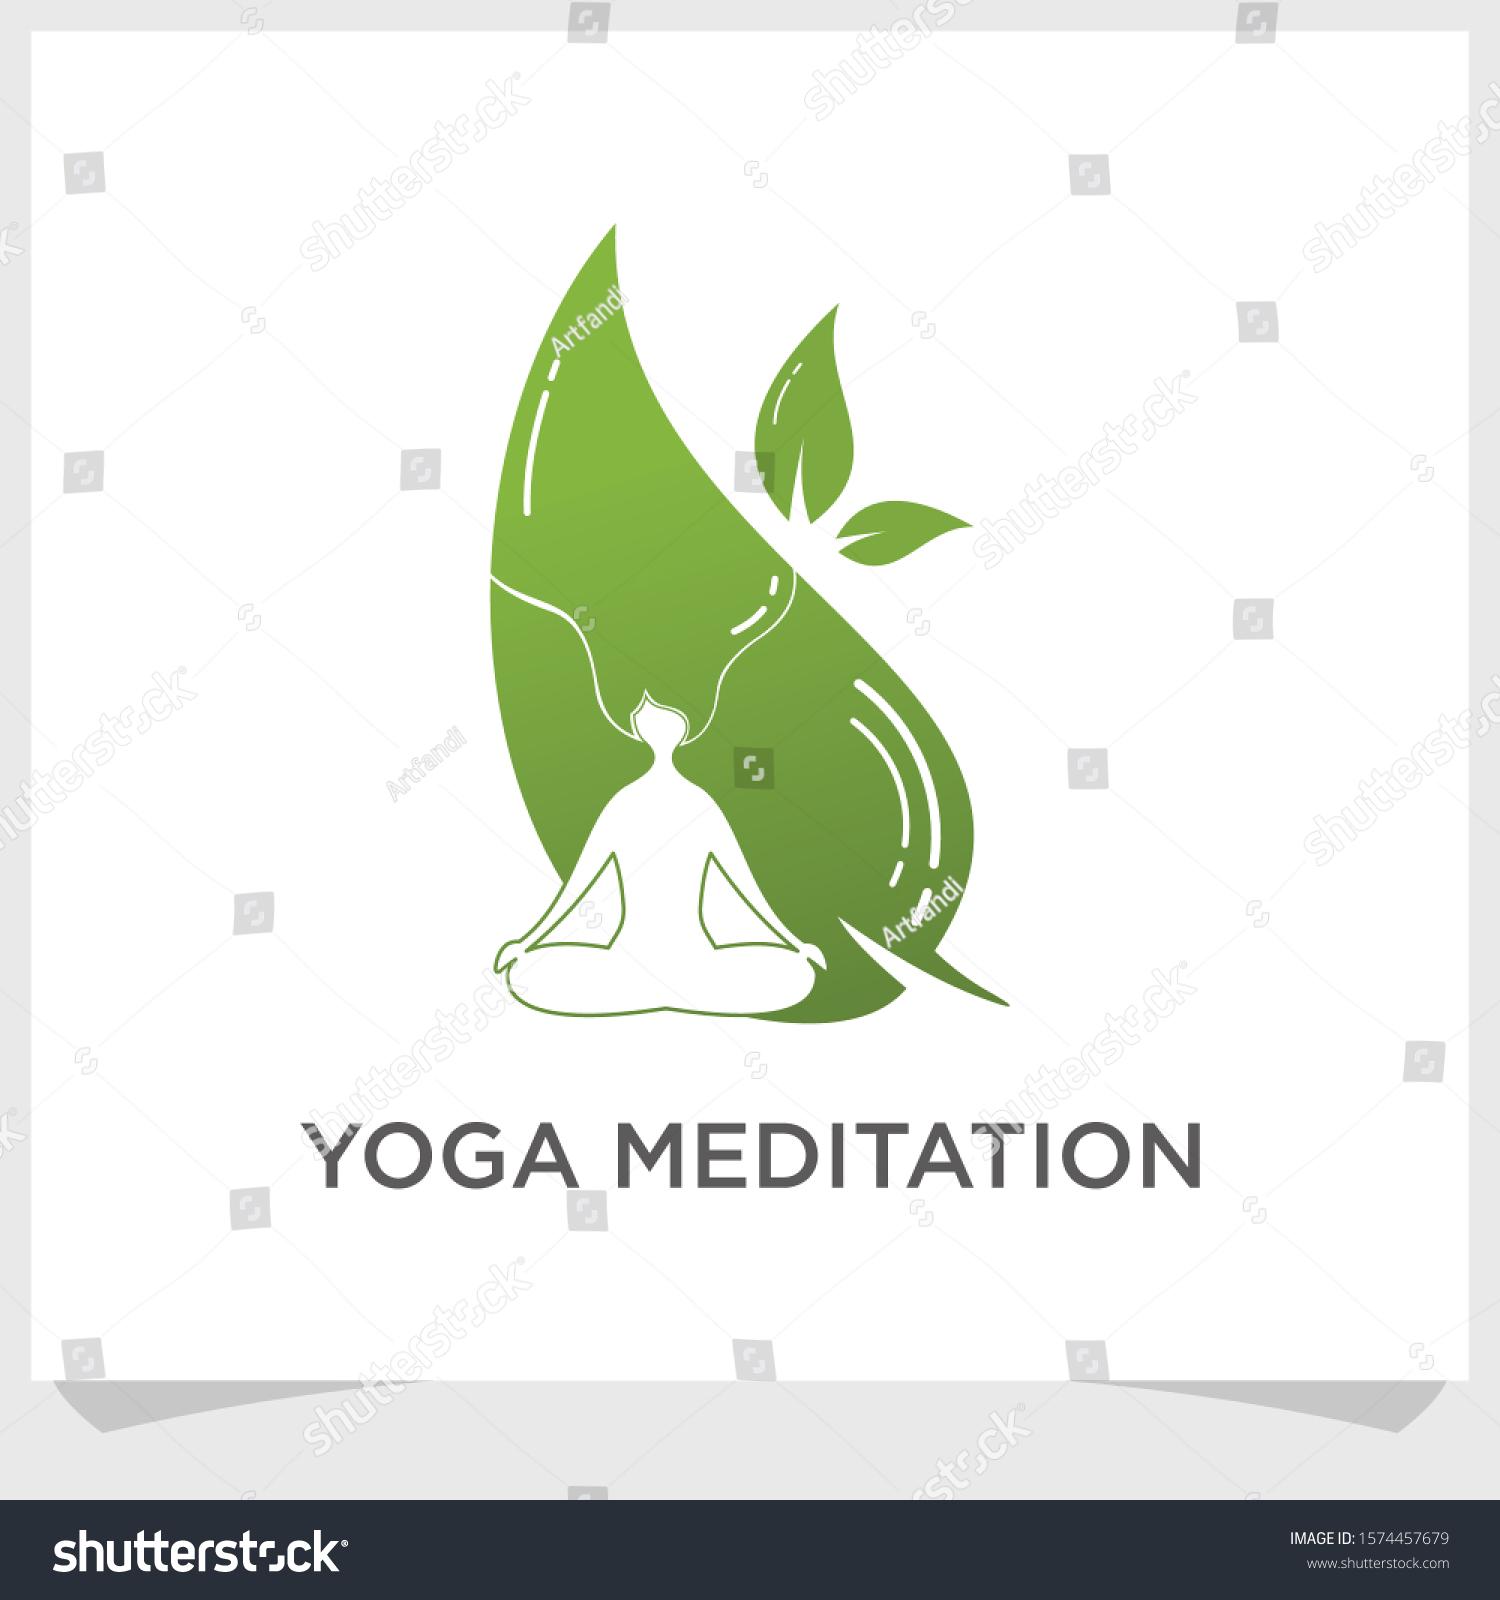 yoga meditation logo design inspiration spa stock vector royalty free 1574457679 https www shutterstock com image vector yoga meditation logo design inspiration spa 1574457679